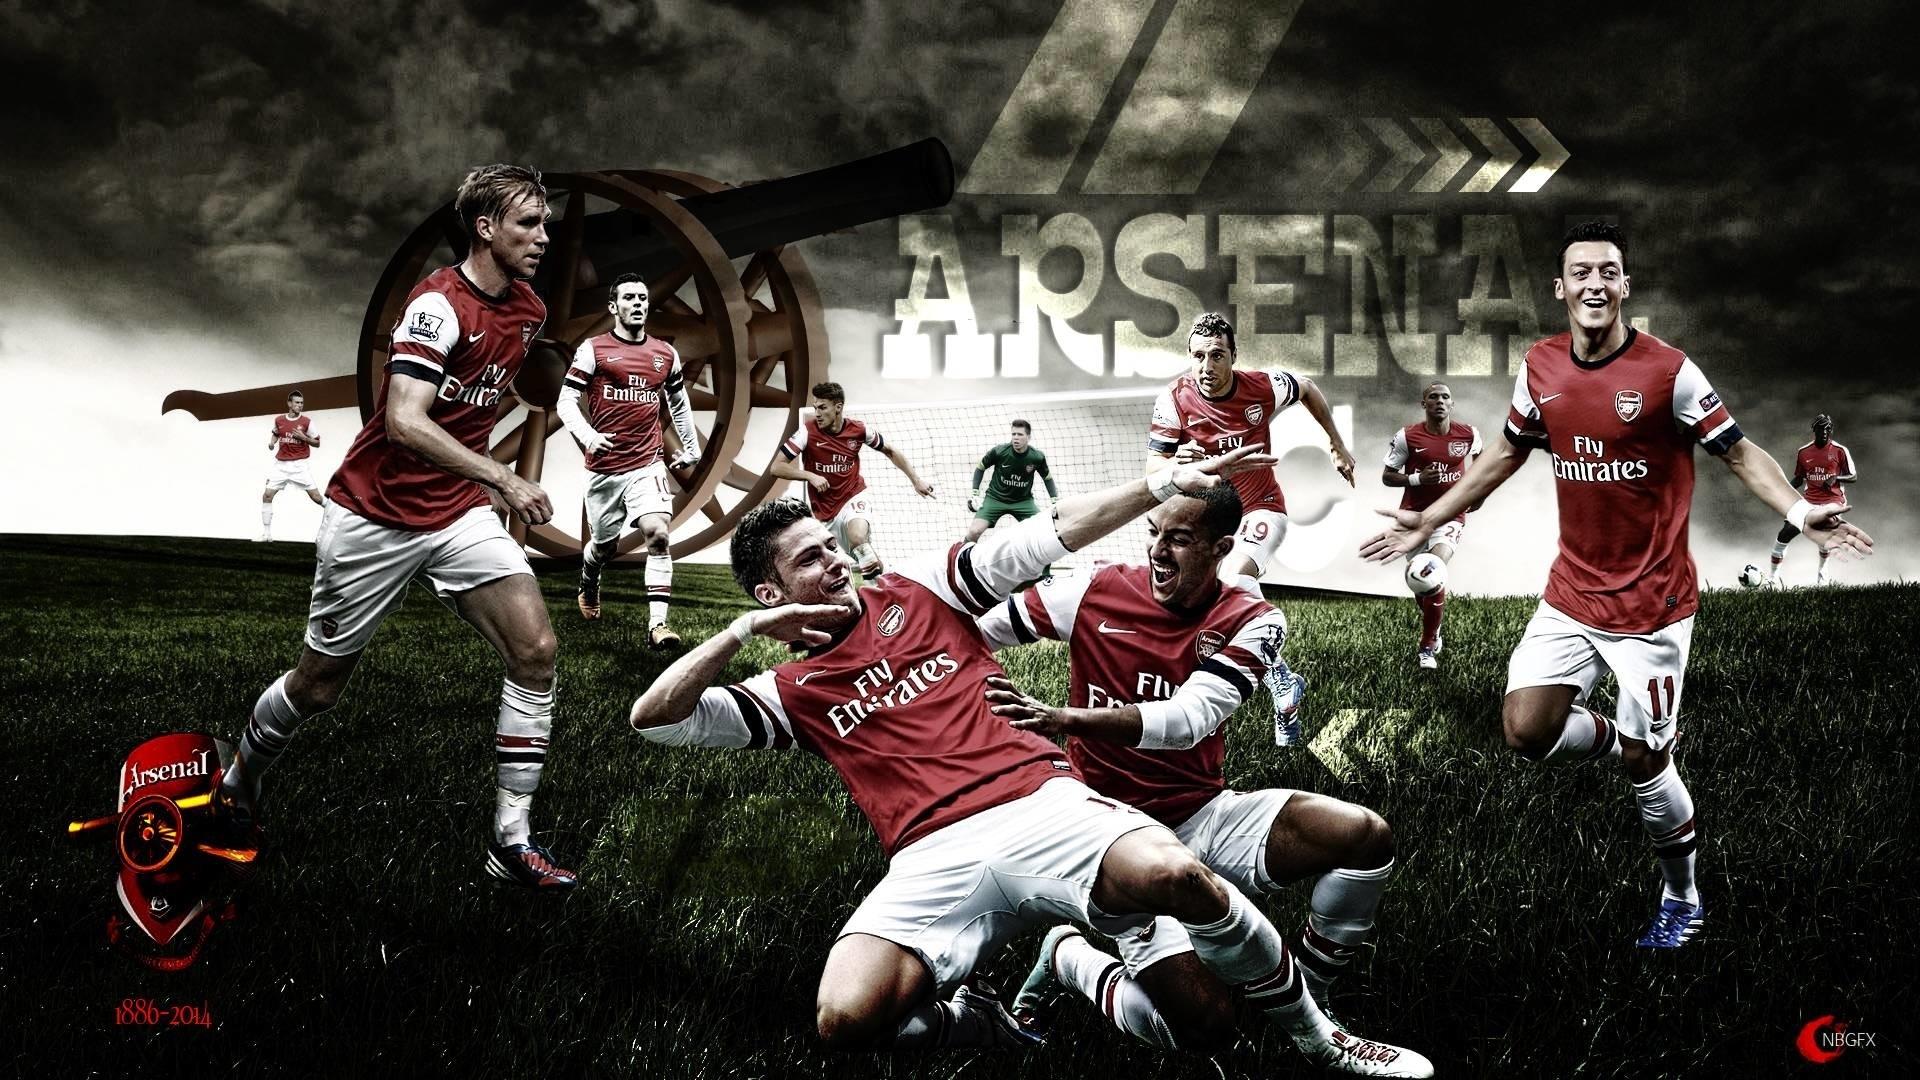 Arsenal wallpaper photo hd